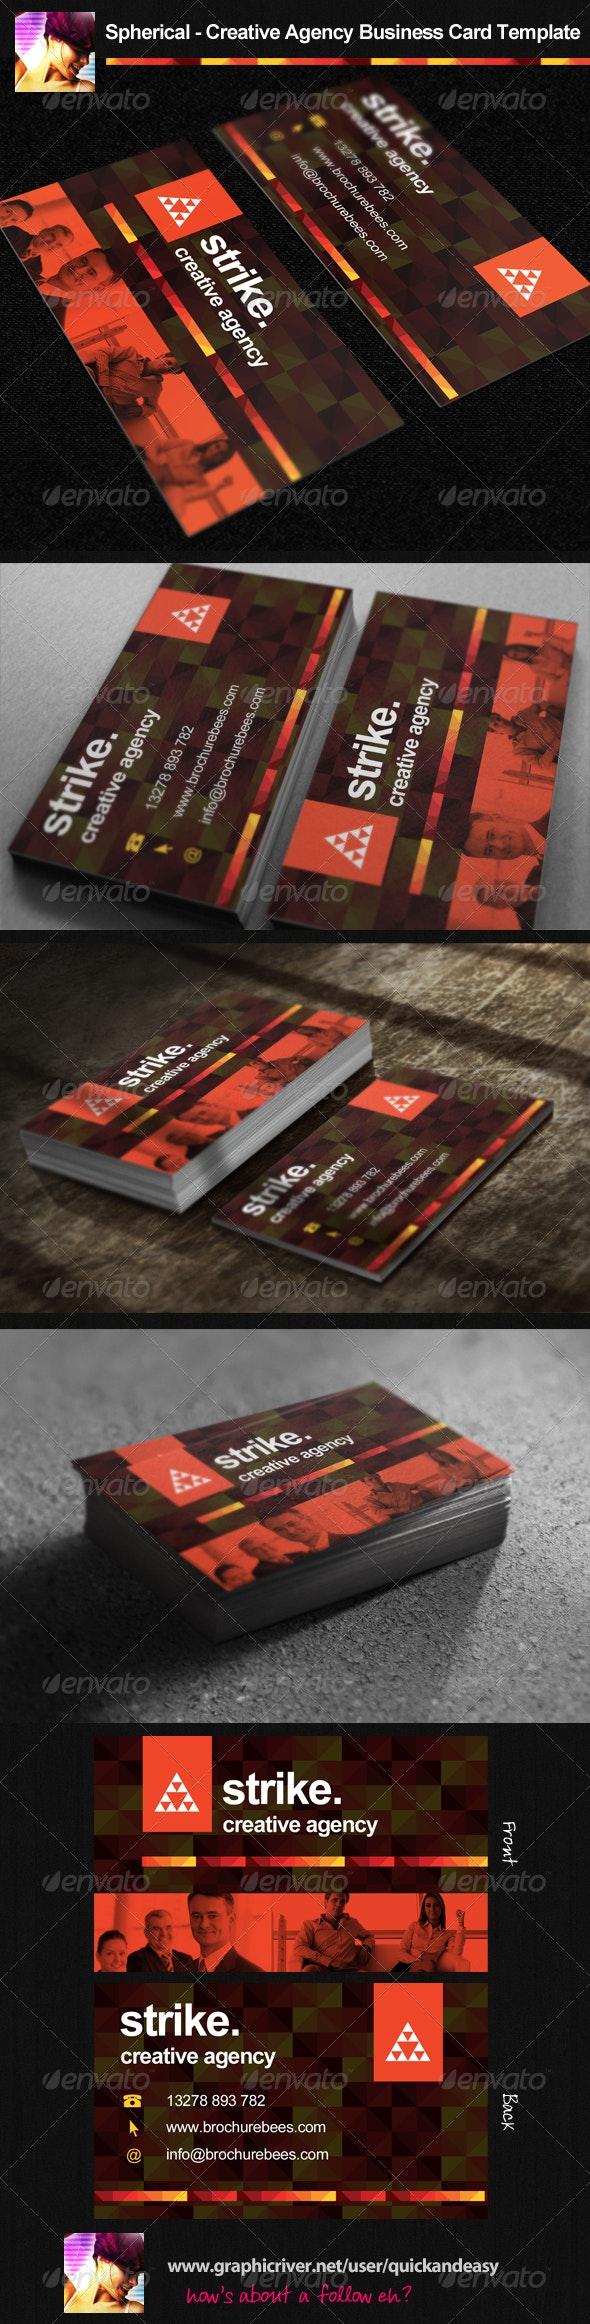 Strike Creative Agency Business Card Template - Creative Business Cards